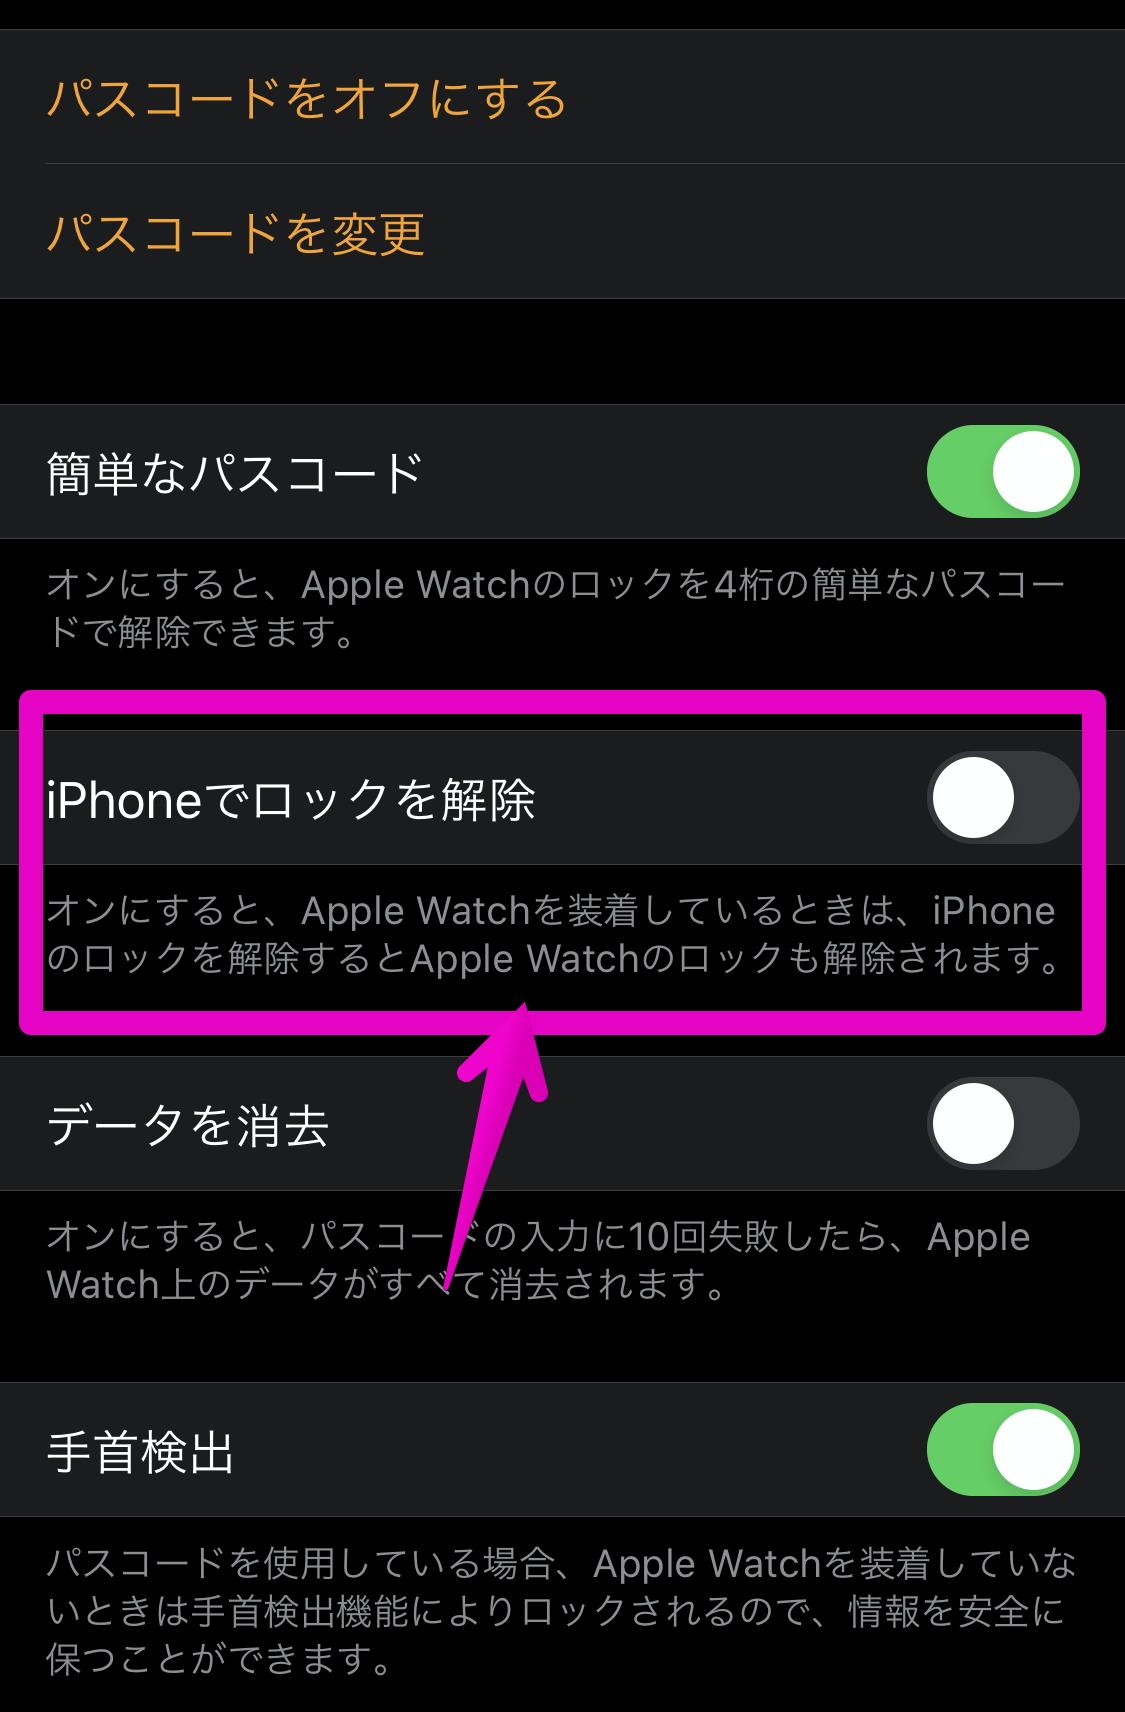 Iphone apple watch ロック 解除 マスク着用時にiPhoneのロックをApple